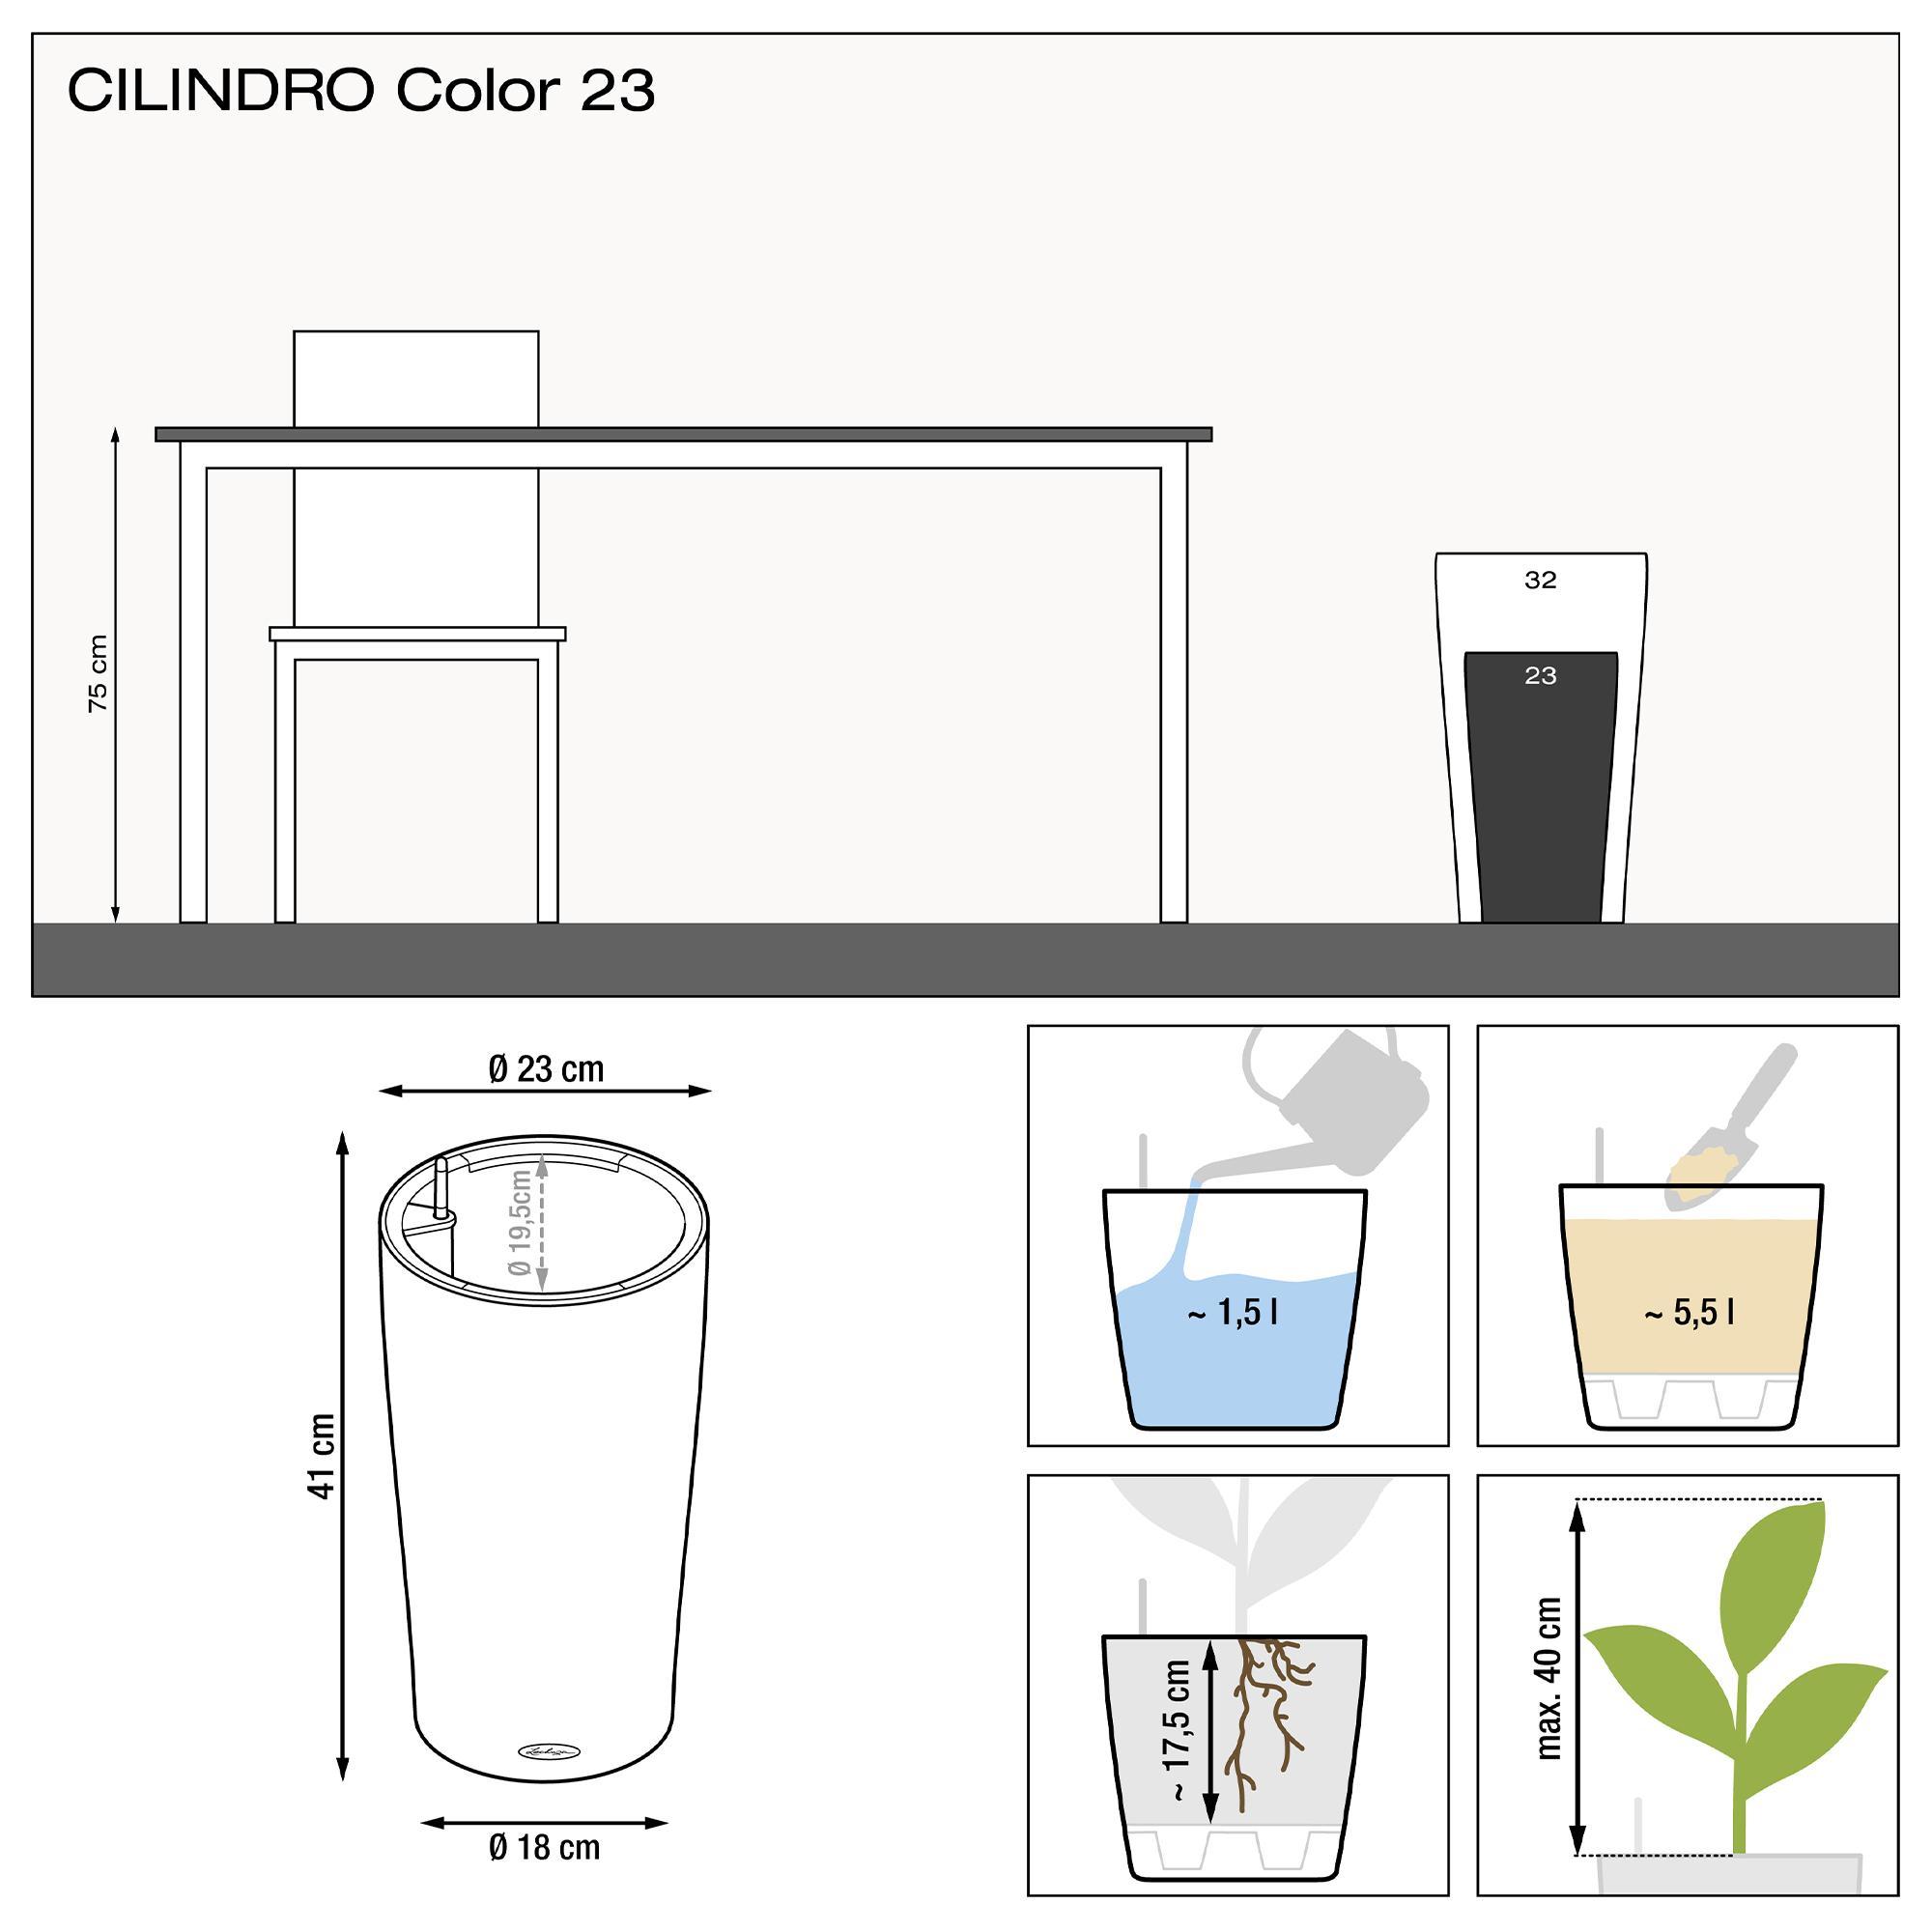 CILINDRO Color 23 slate - Image 3